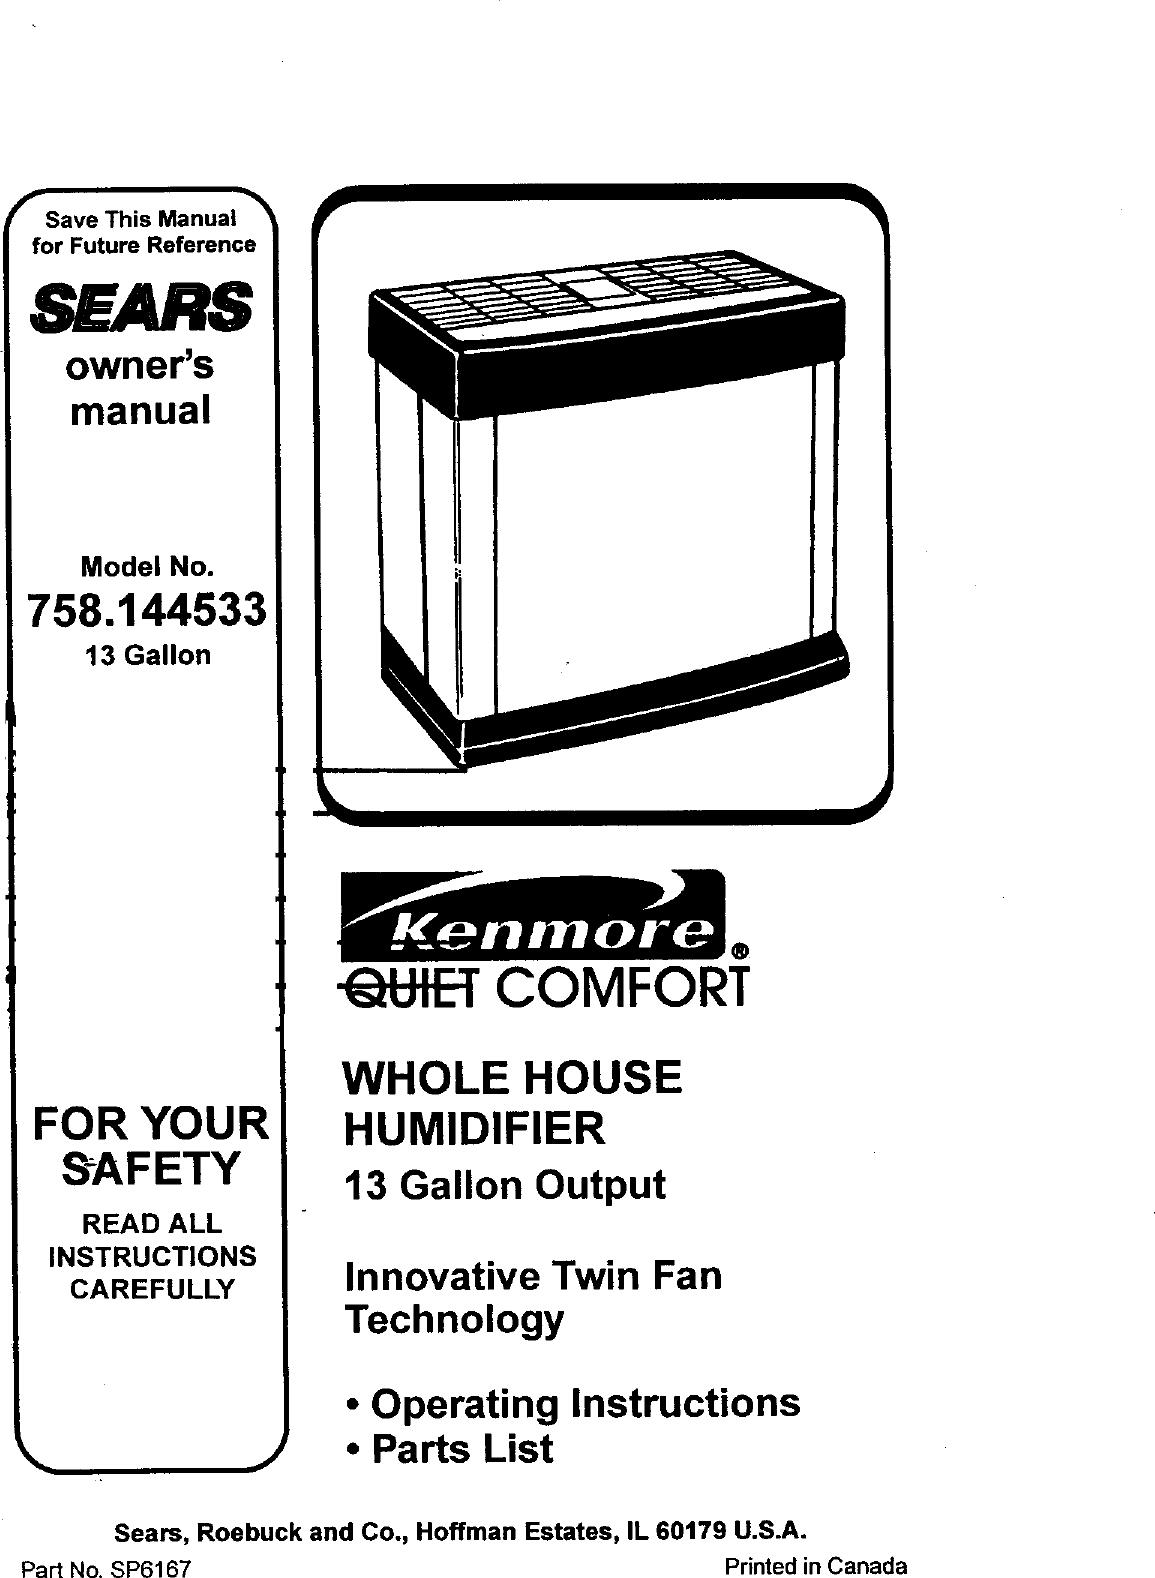 Sears Kemore 758 144533 Users Manual